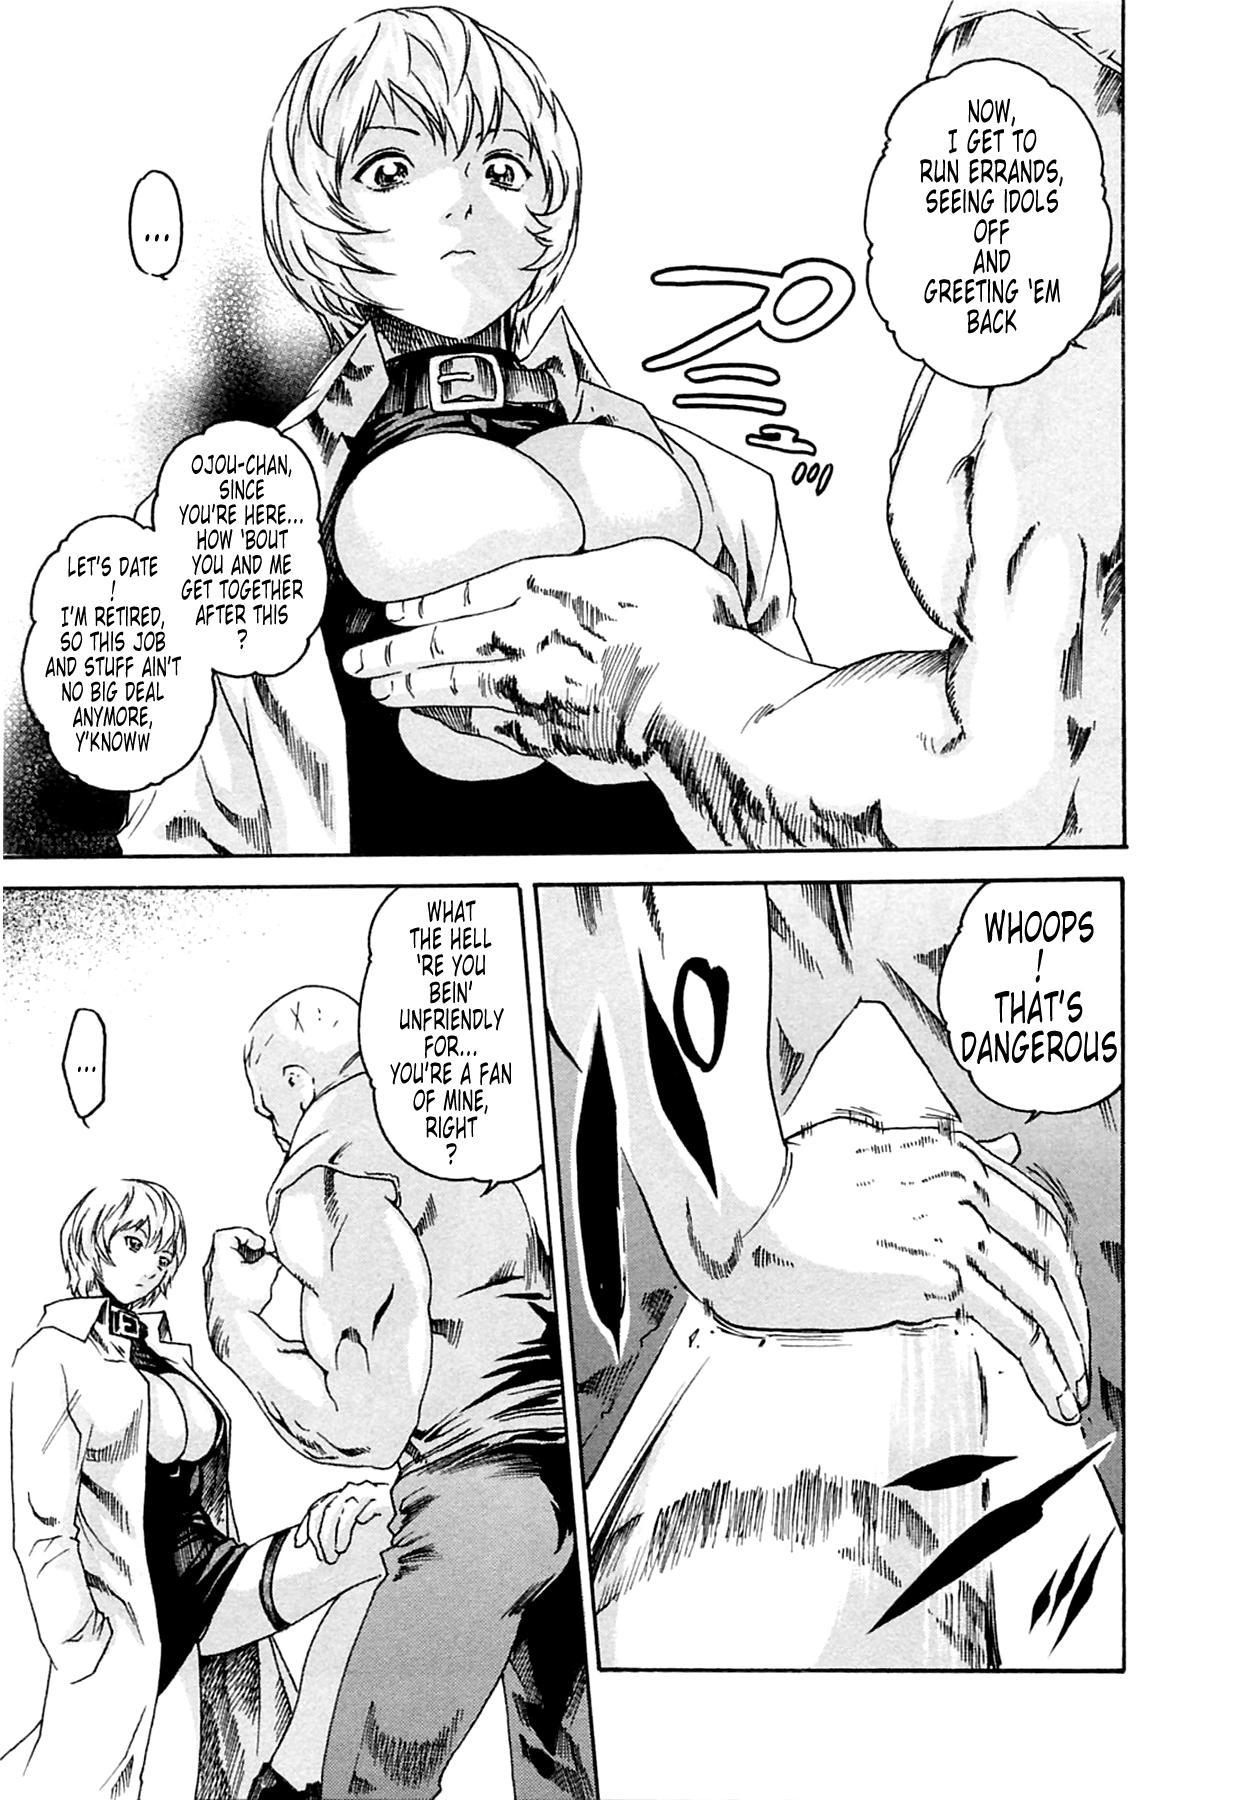 [Haruki] Kisei Juui Suzune (Parasite Doctor Suzune) Vol.02 - CH10-11 40